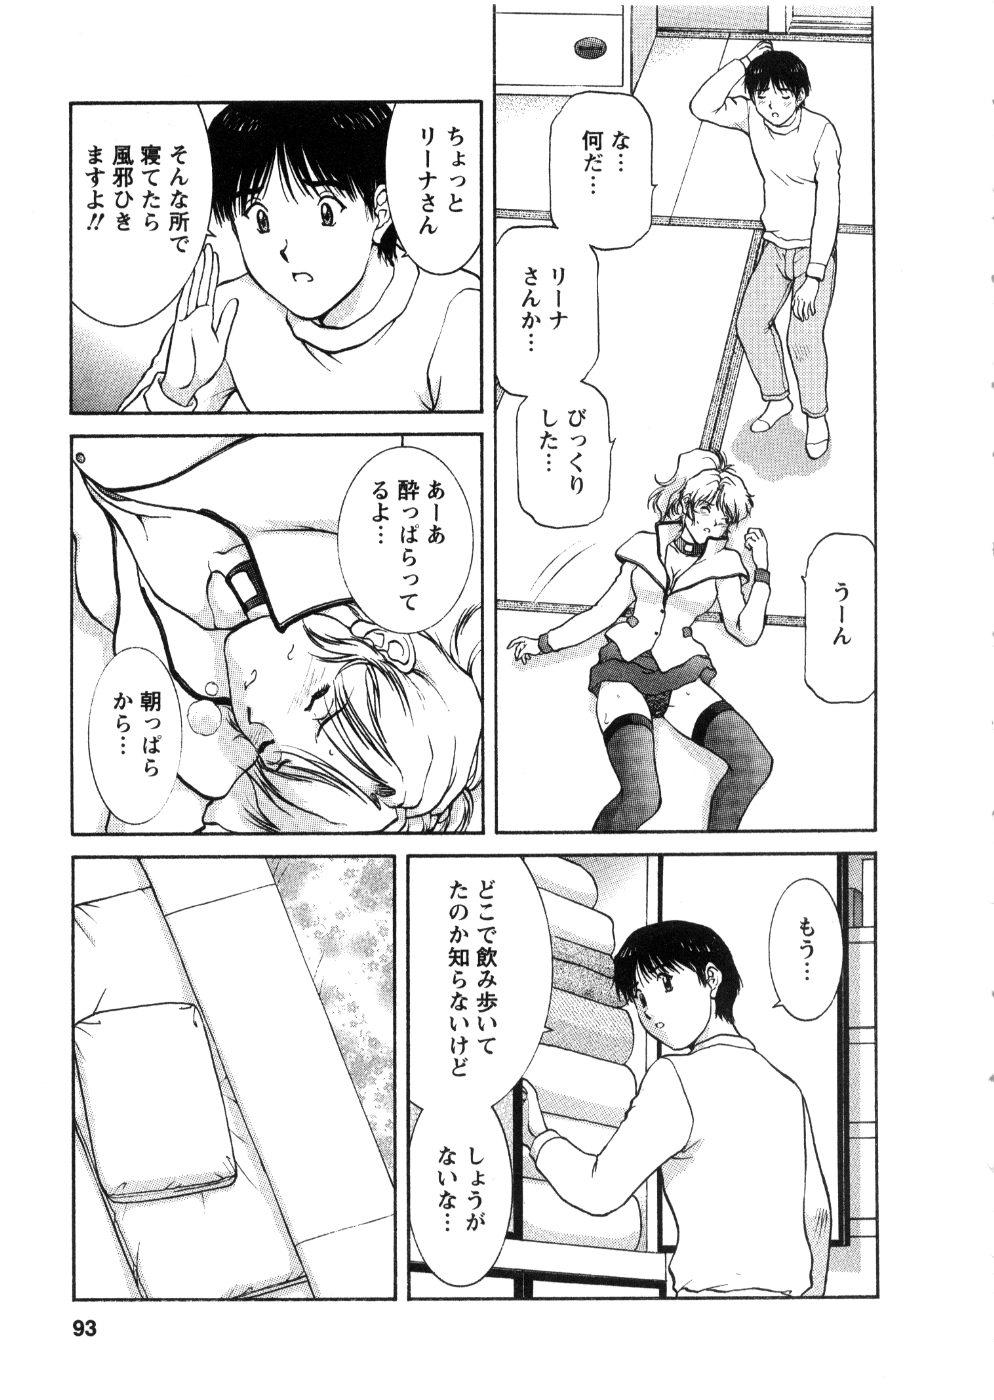 Oneechan-tachi ga Yatte Kuru 03 94